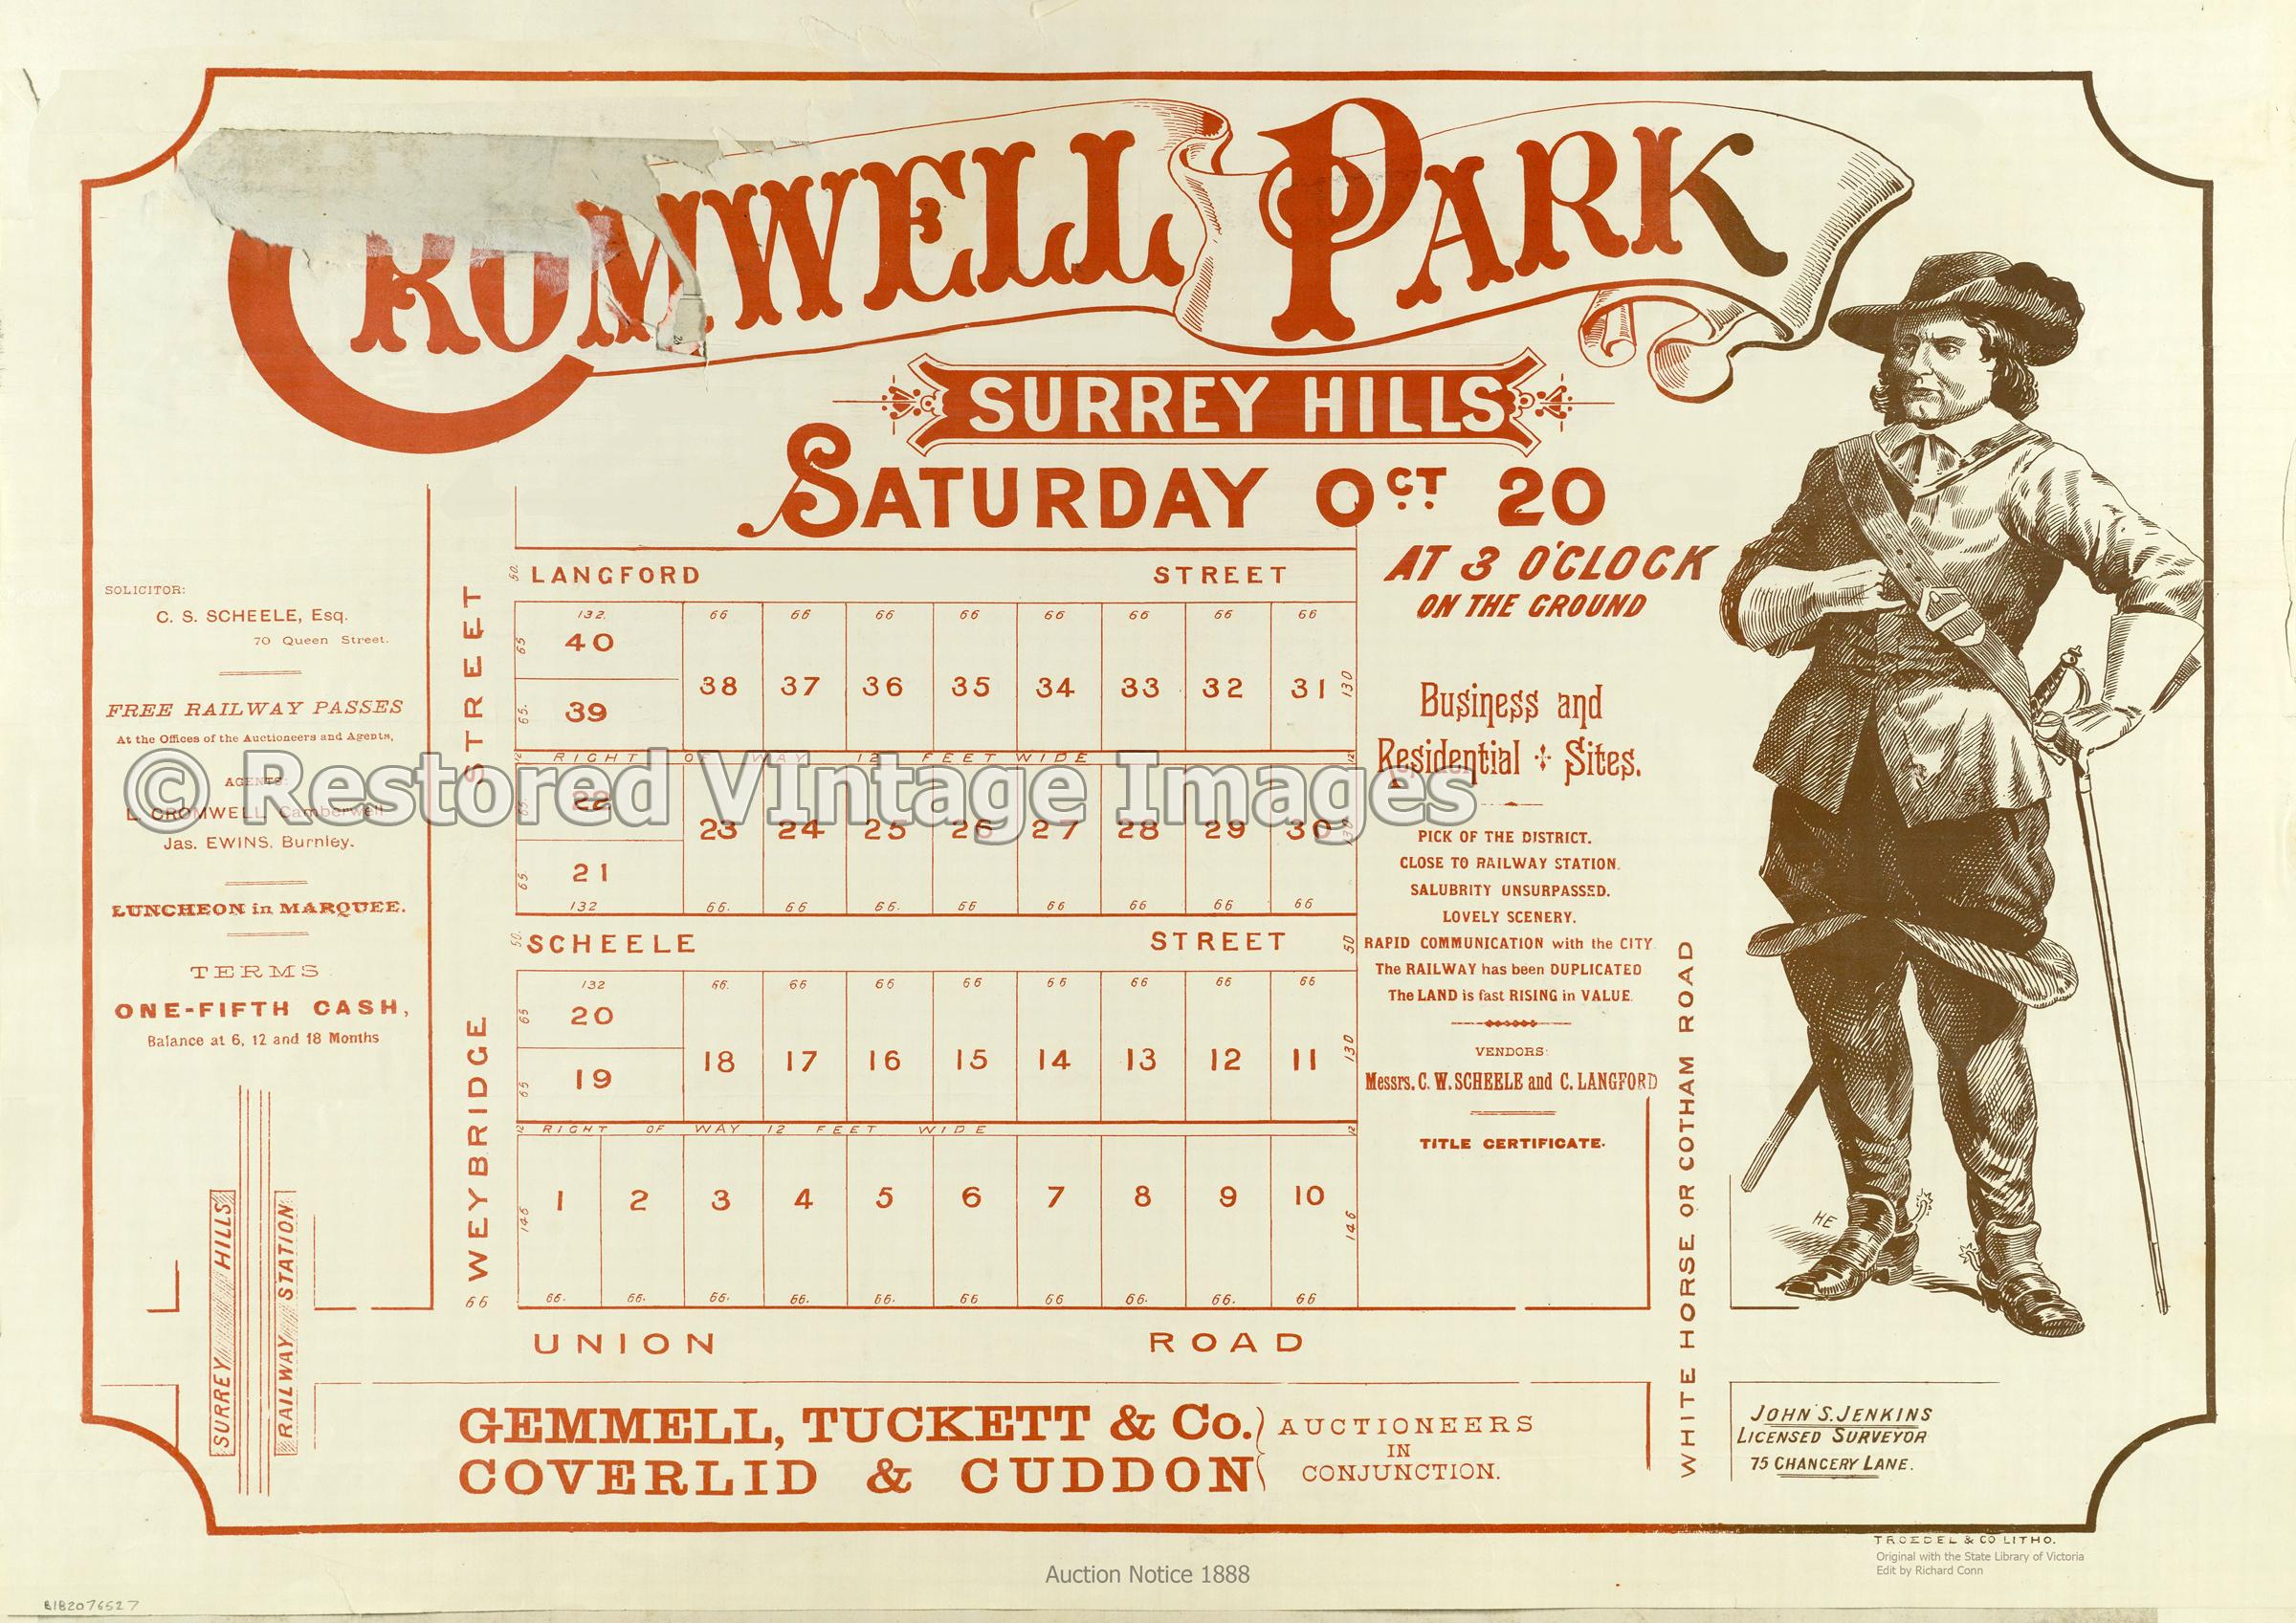 Cromwell Park Estate 1888 – Surrey Hills